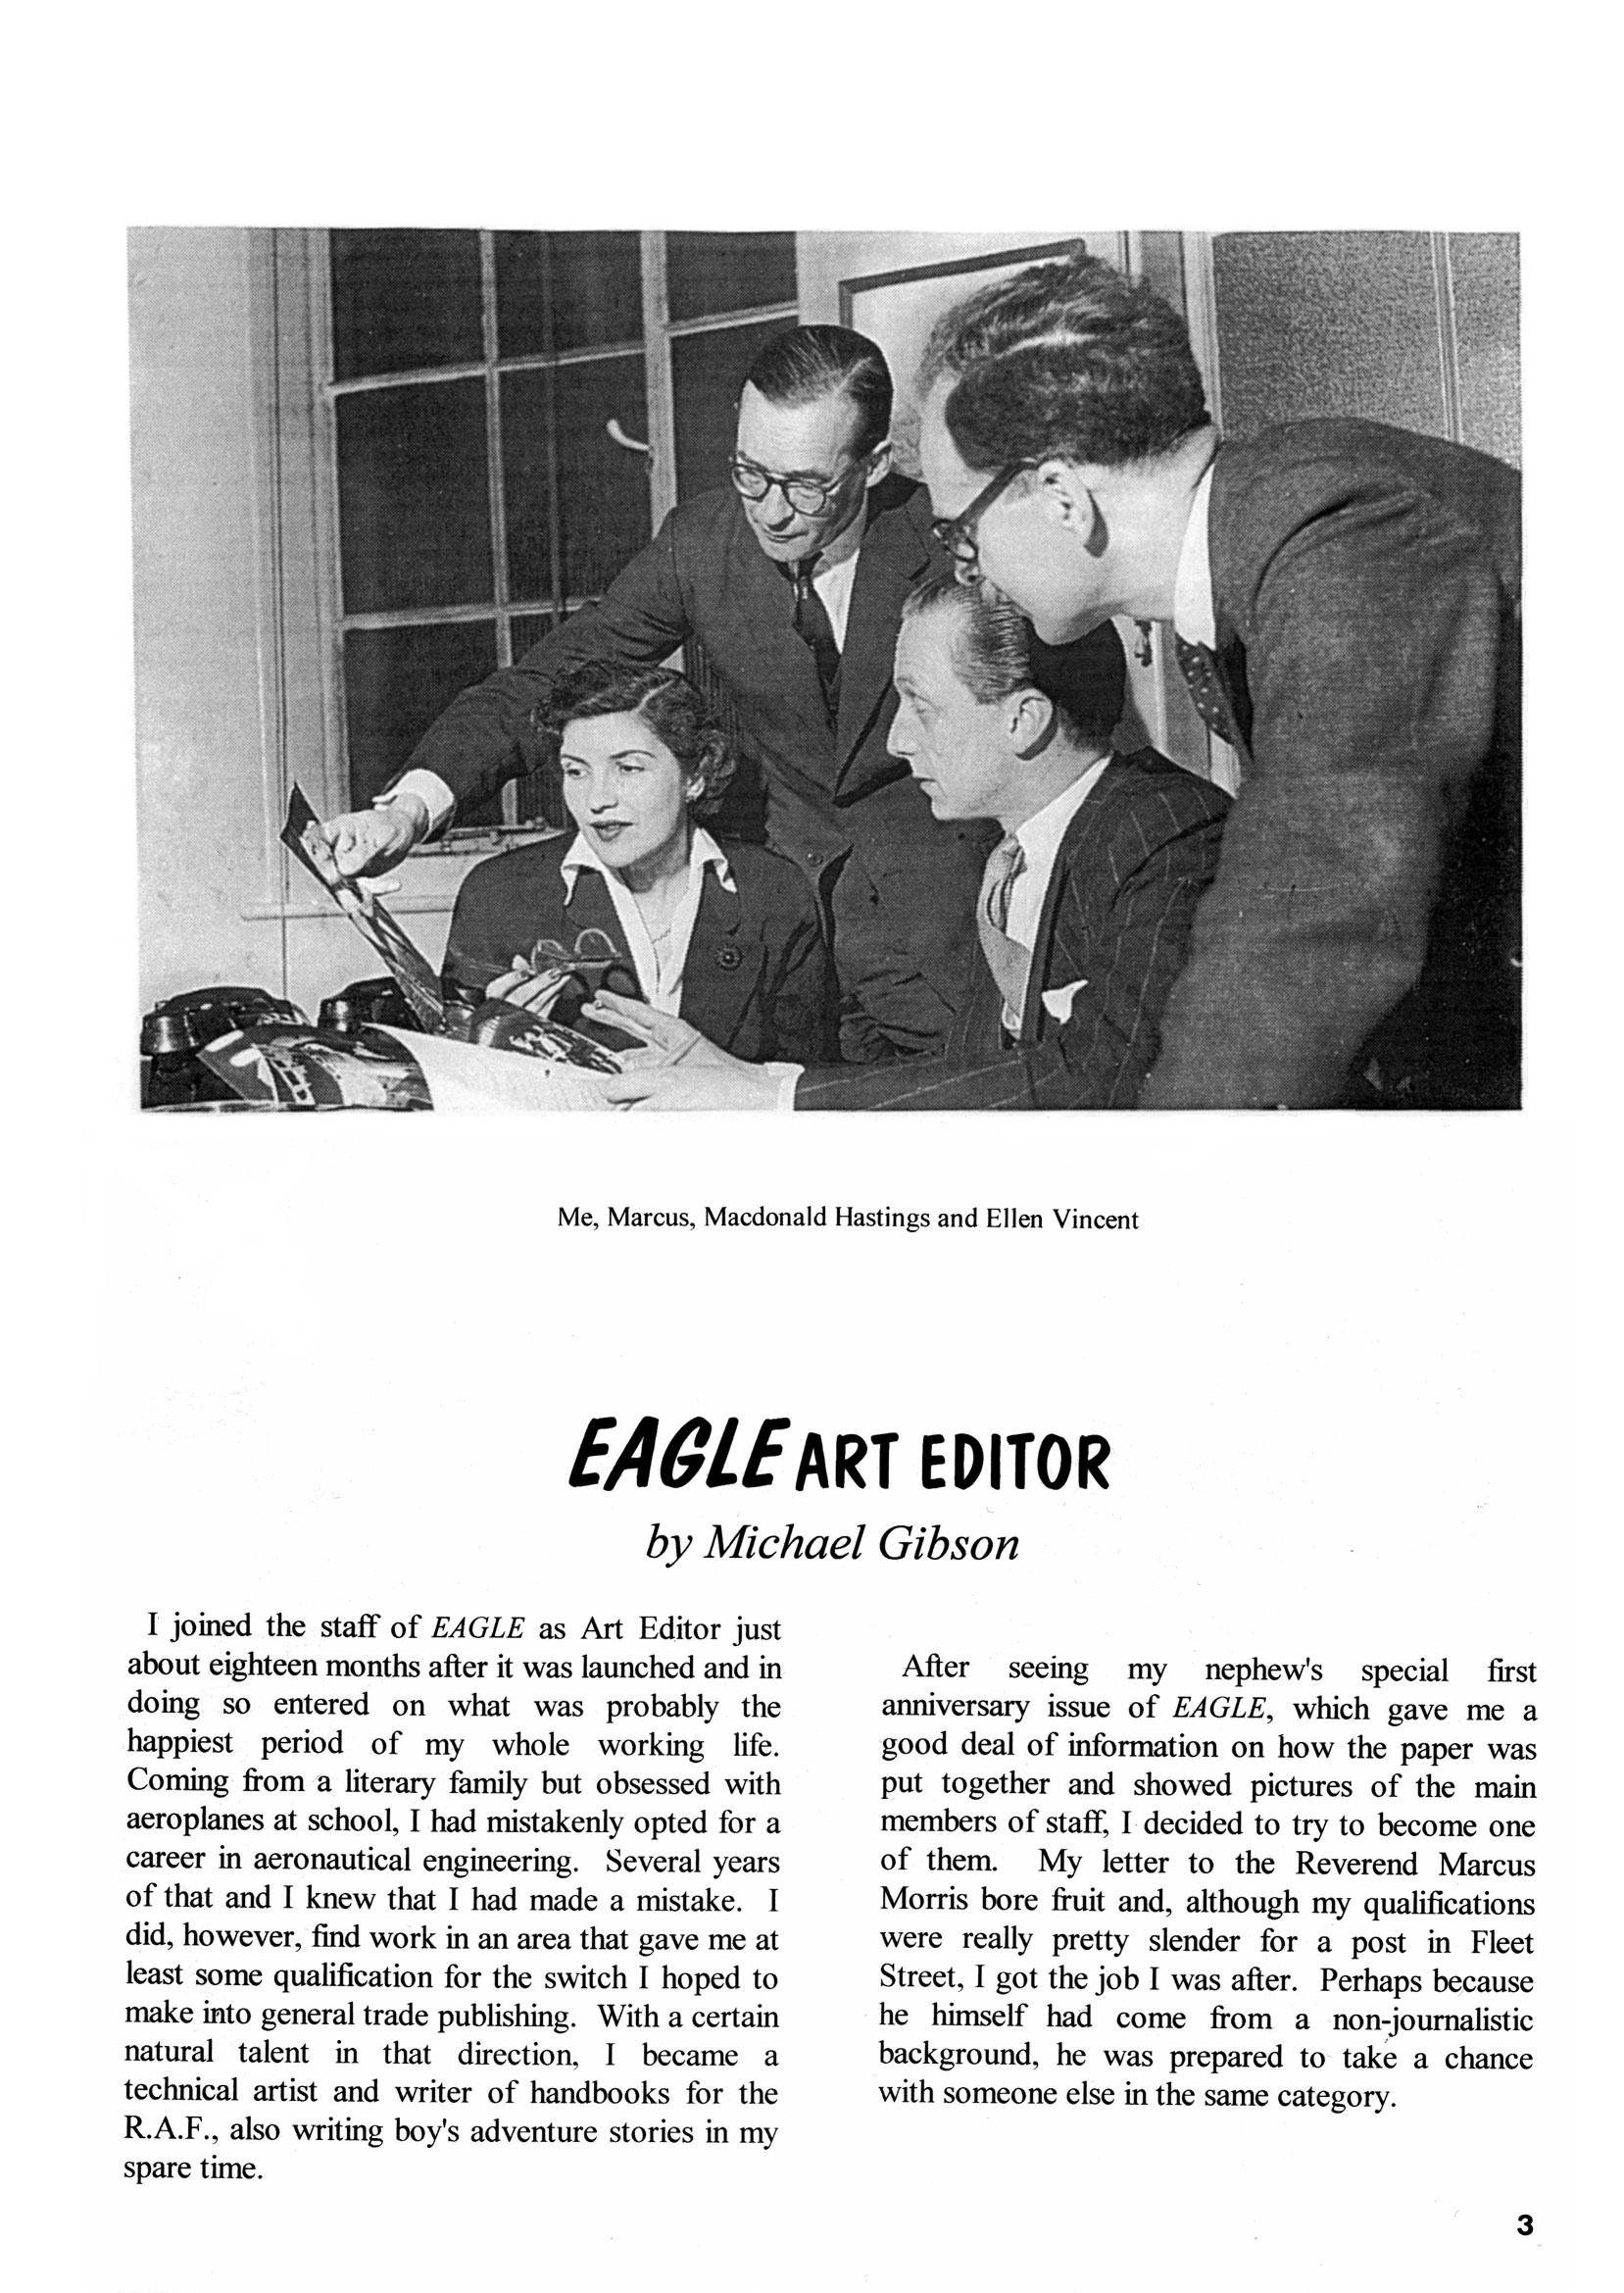 Eagle art editor page 1